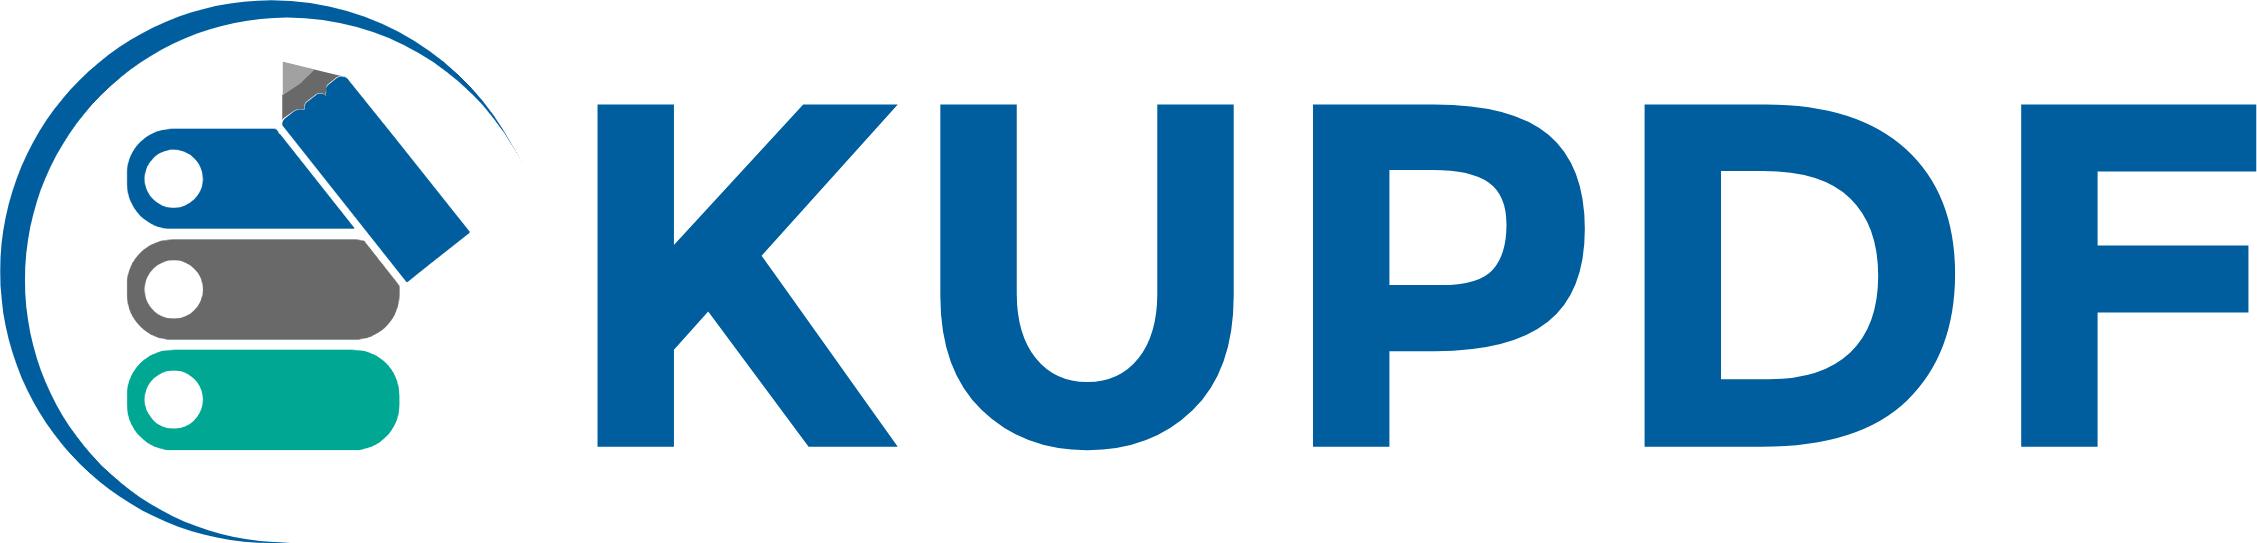 KUPDF - Free document sharing platform - Upload and share